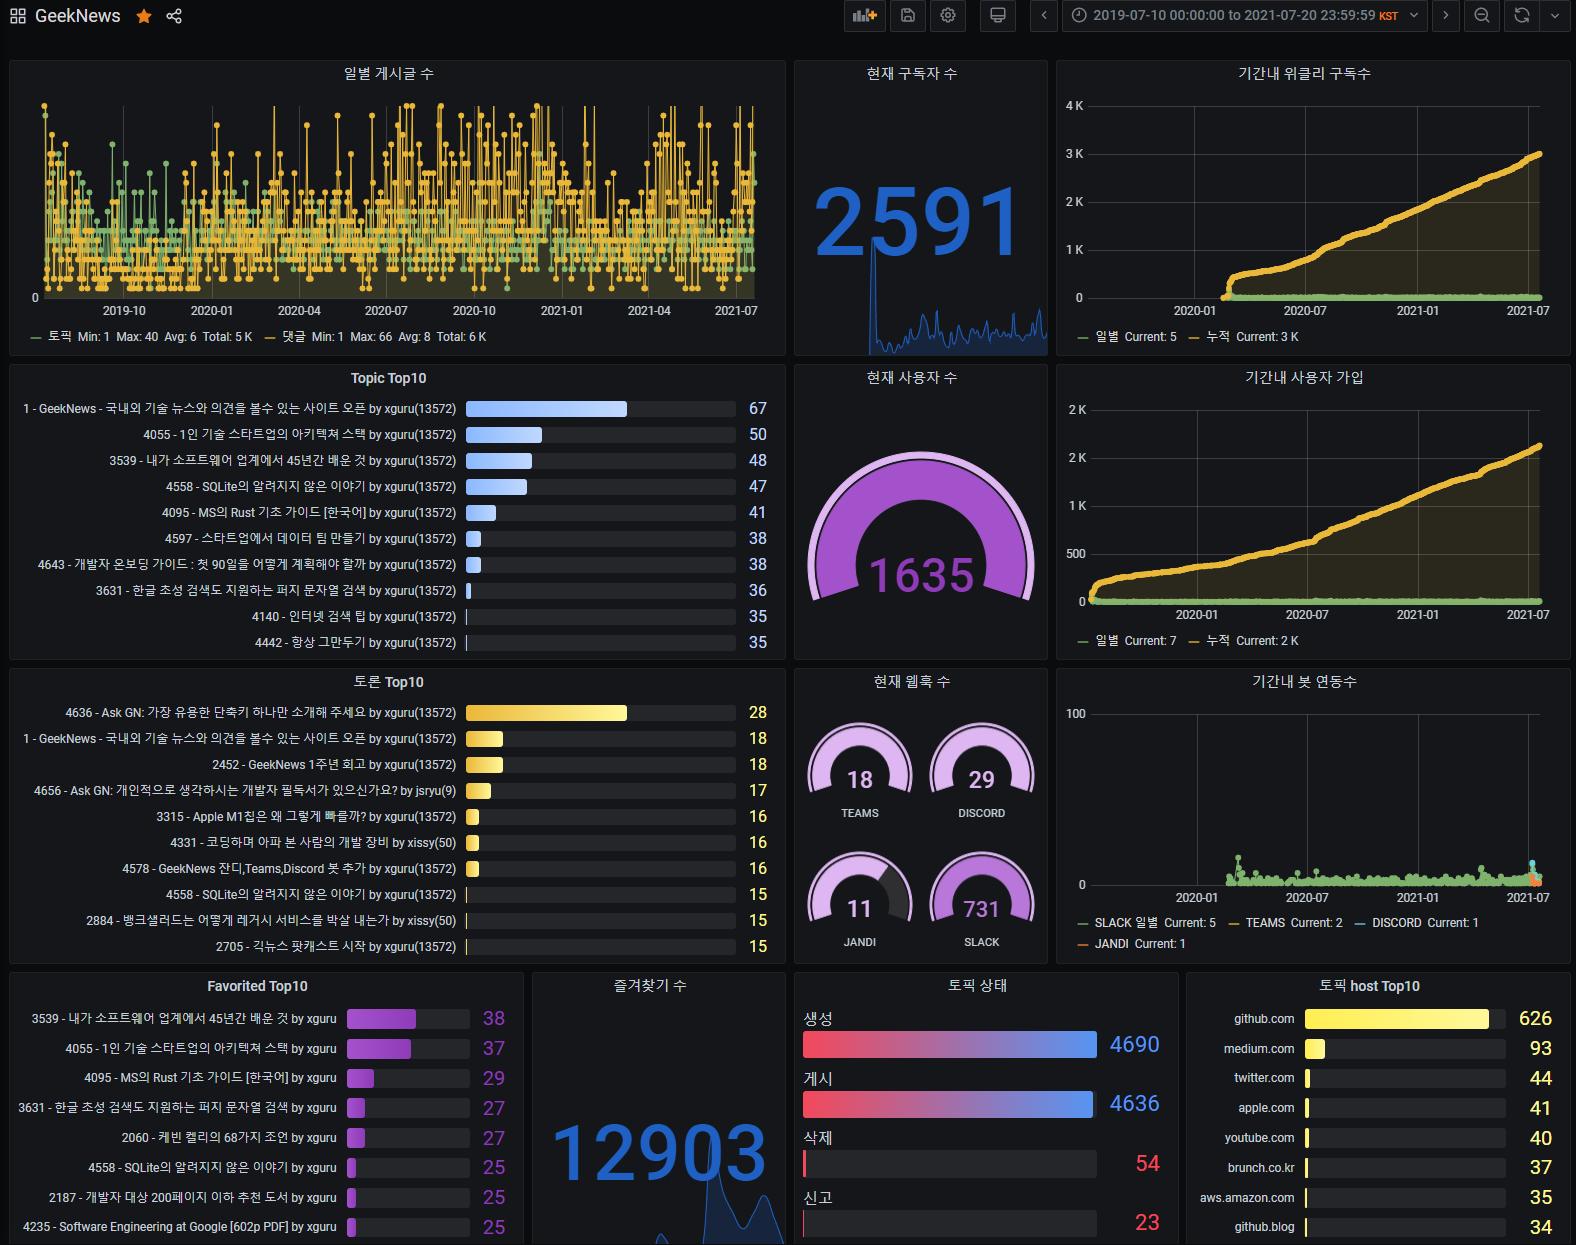 GeekNews Dashboard 1 Year